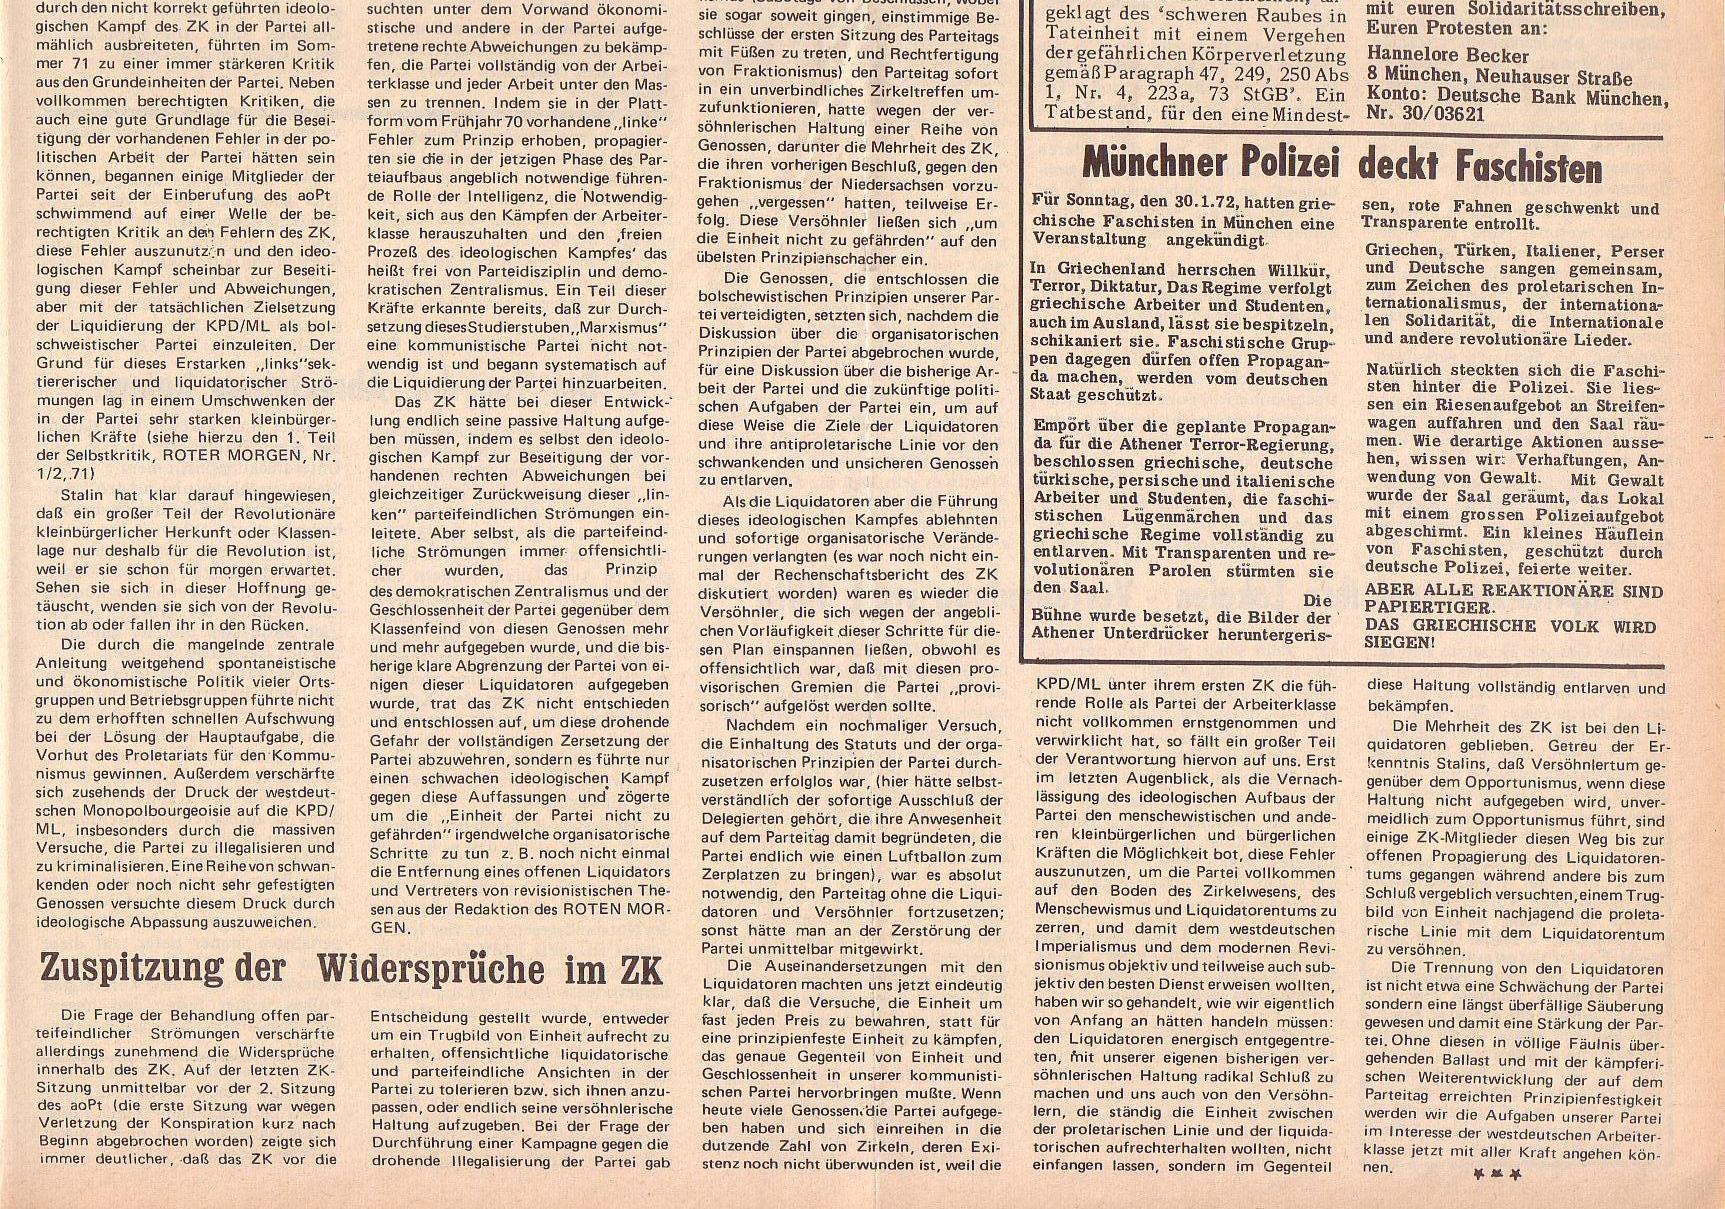 Roter Morgen, 6. Jg., 14. Februar 1972, Nr. 4, Seite 7b